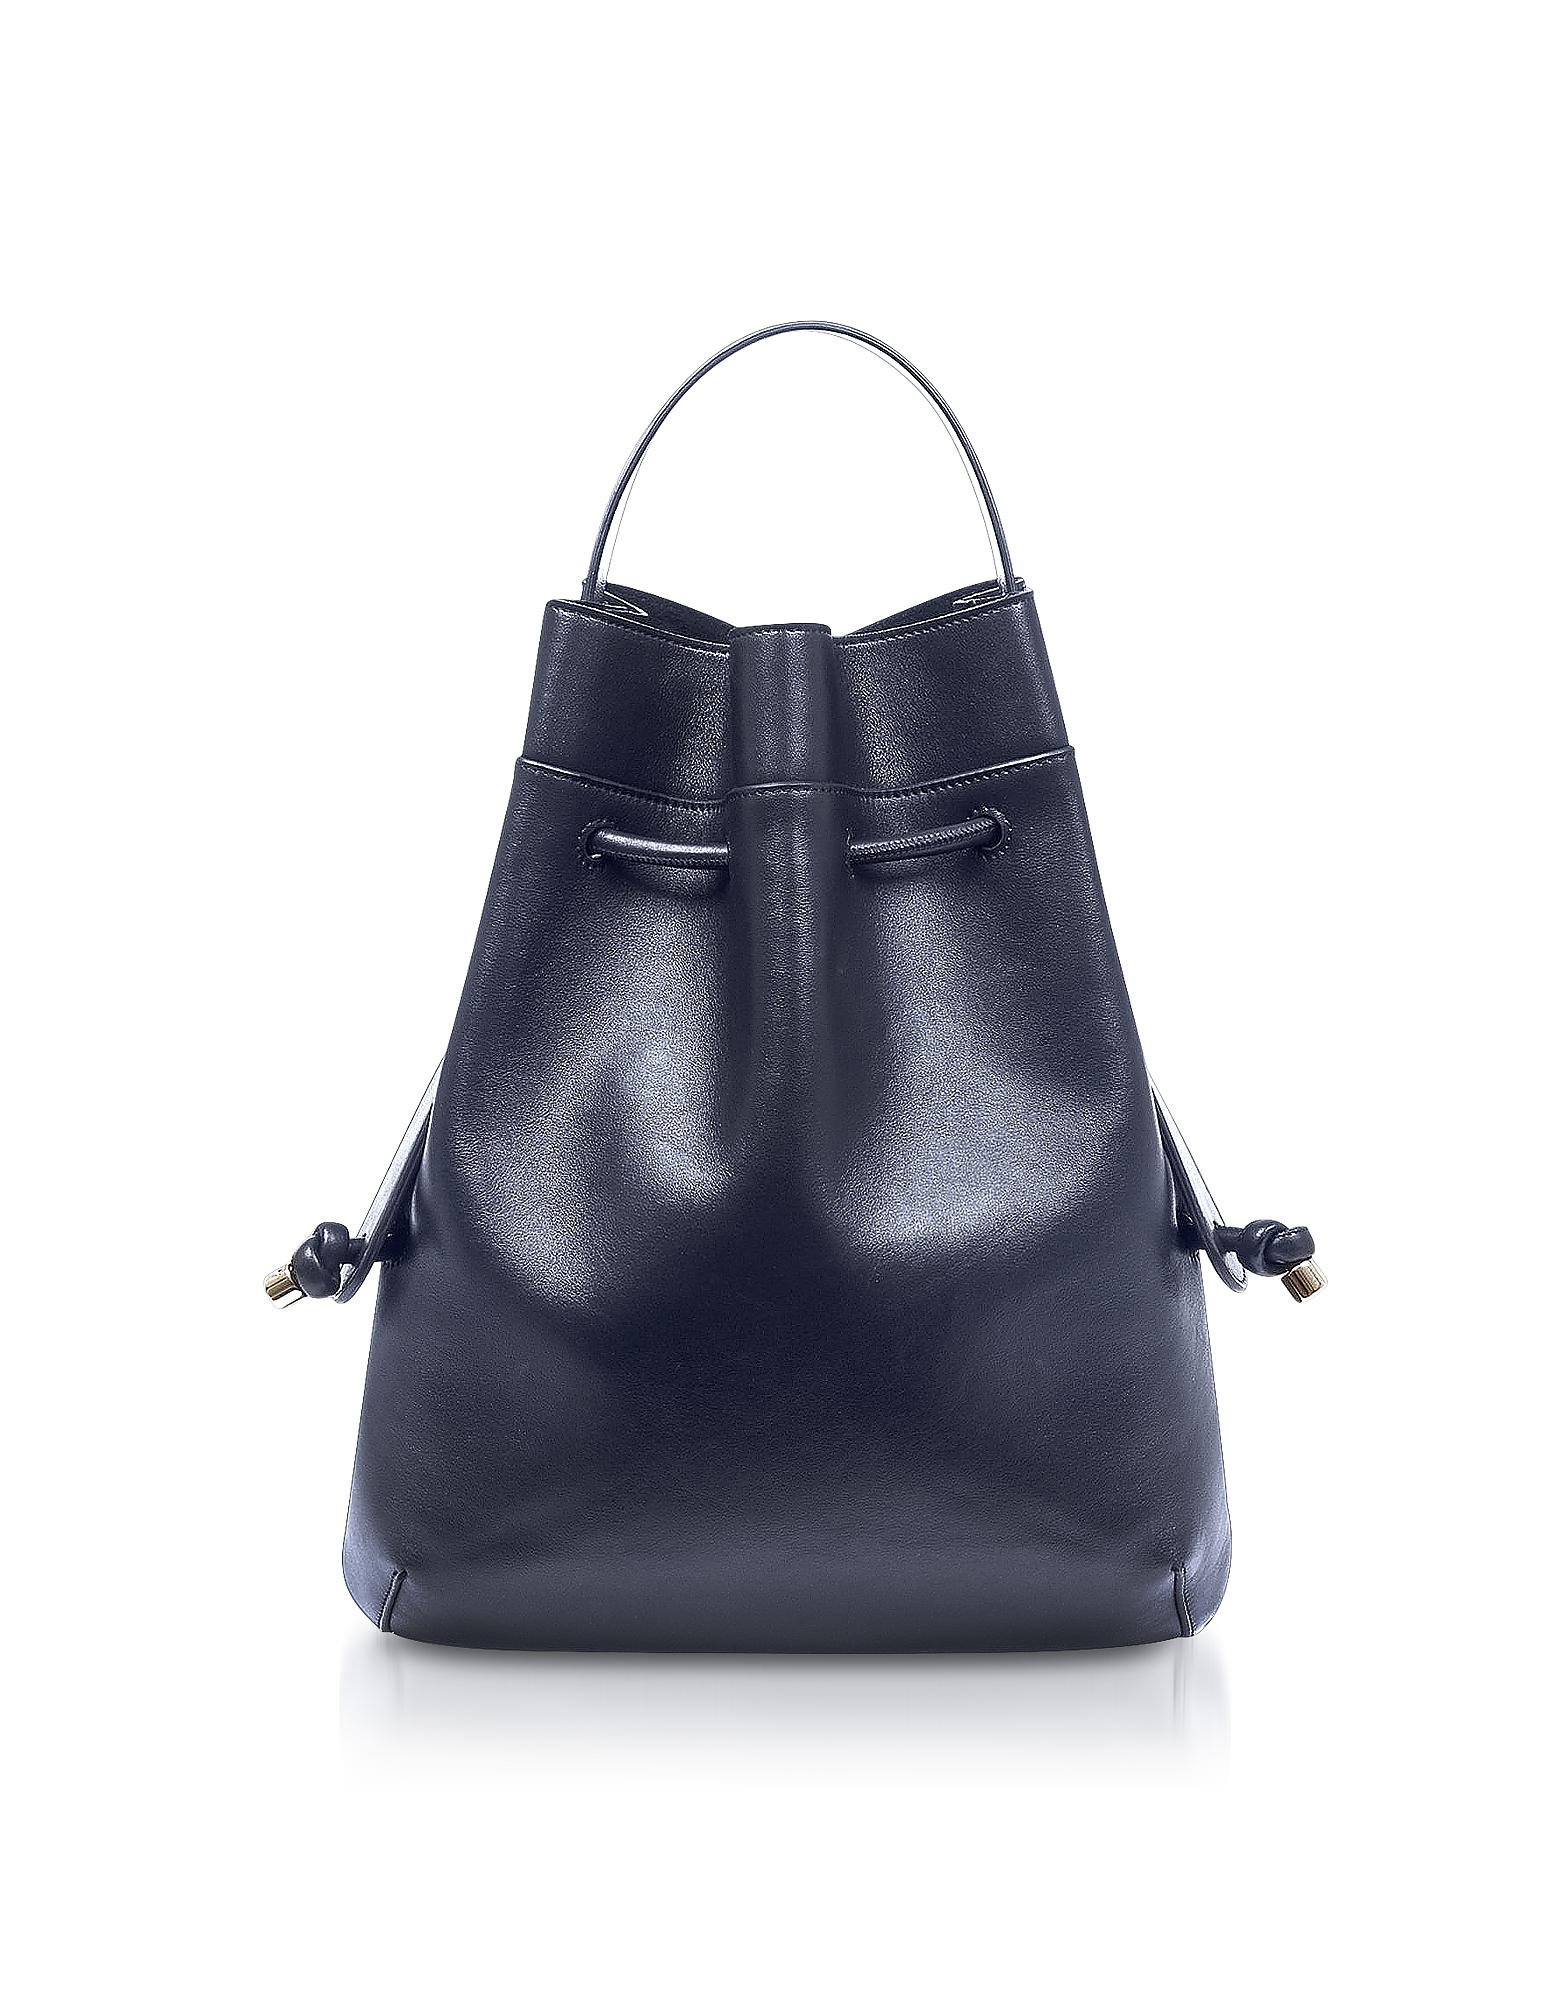 Image of Meli Melo Designer Handbags, Briony Regal Blue Nappa Leather Backpack